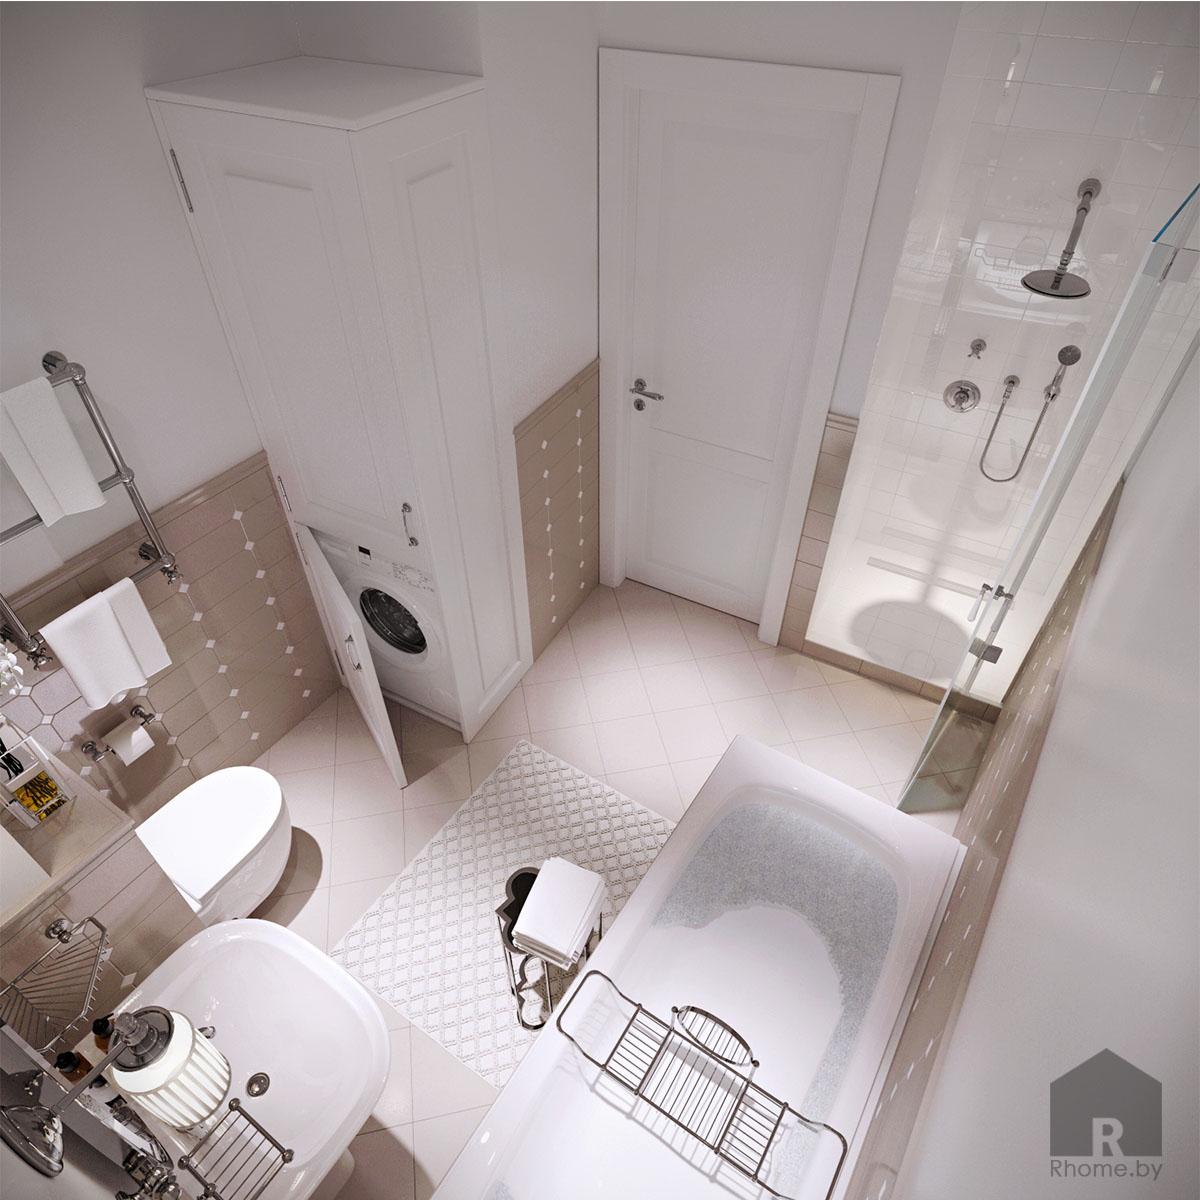 Дизайн интерьера туалета в ретро стиле 50 годов | Дизайн студия – Rhome.by